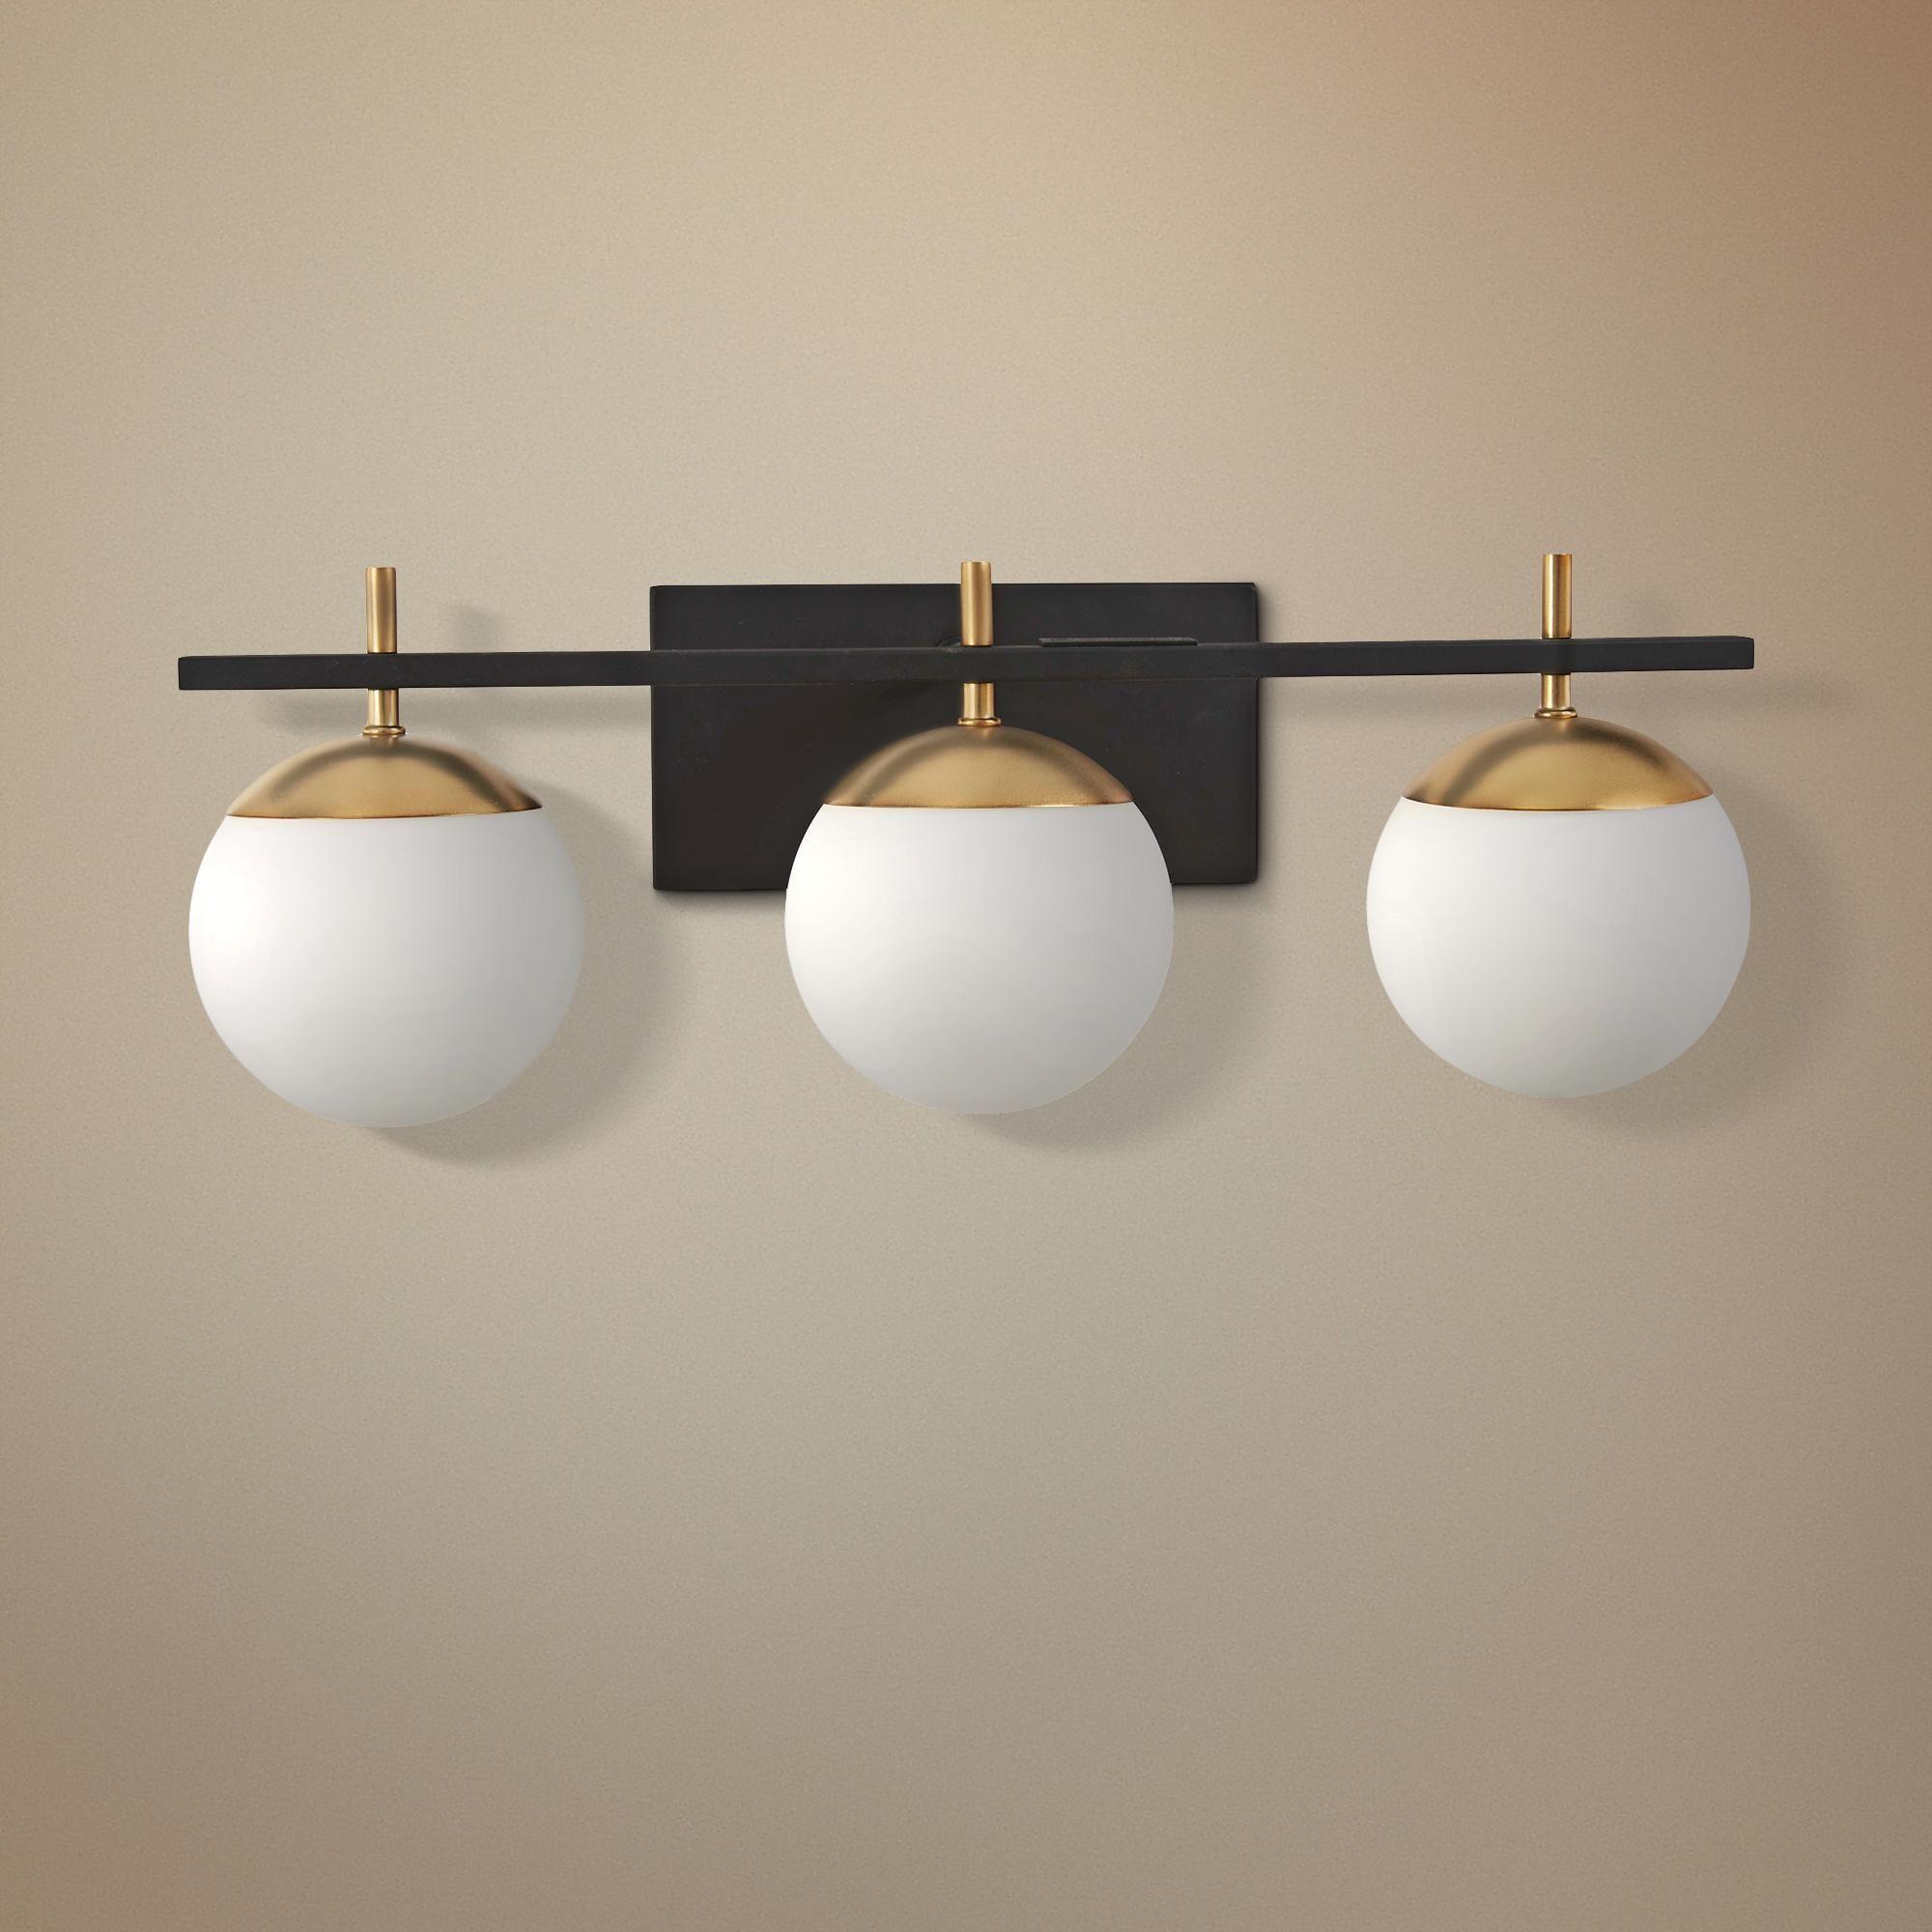 George Kovacs Alluria 24 Inchw Black And Gold 3 Light Bath Light